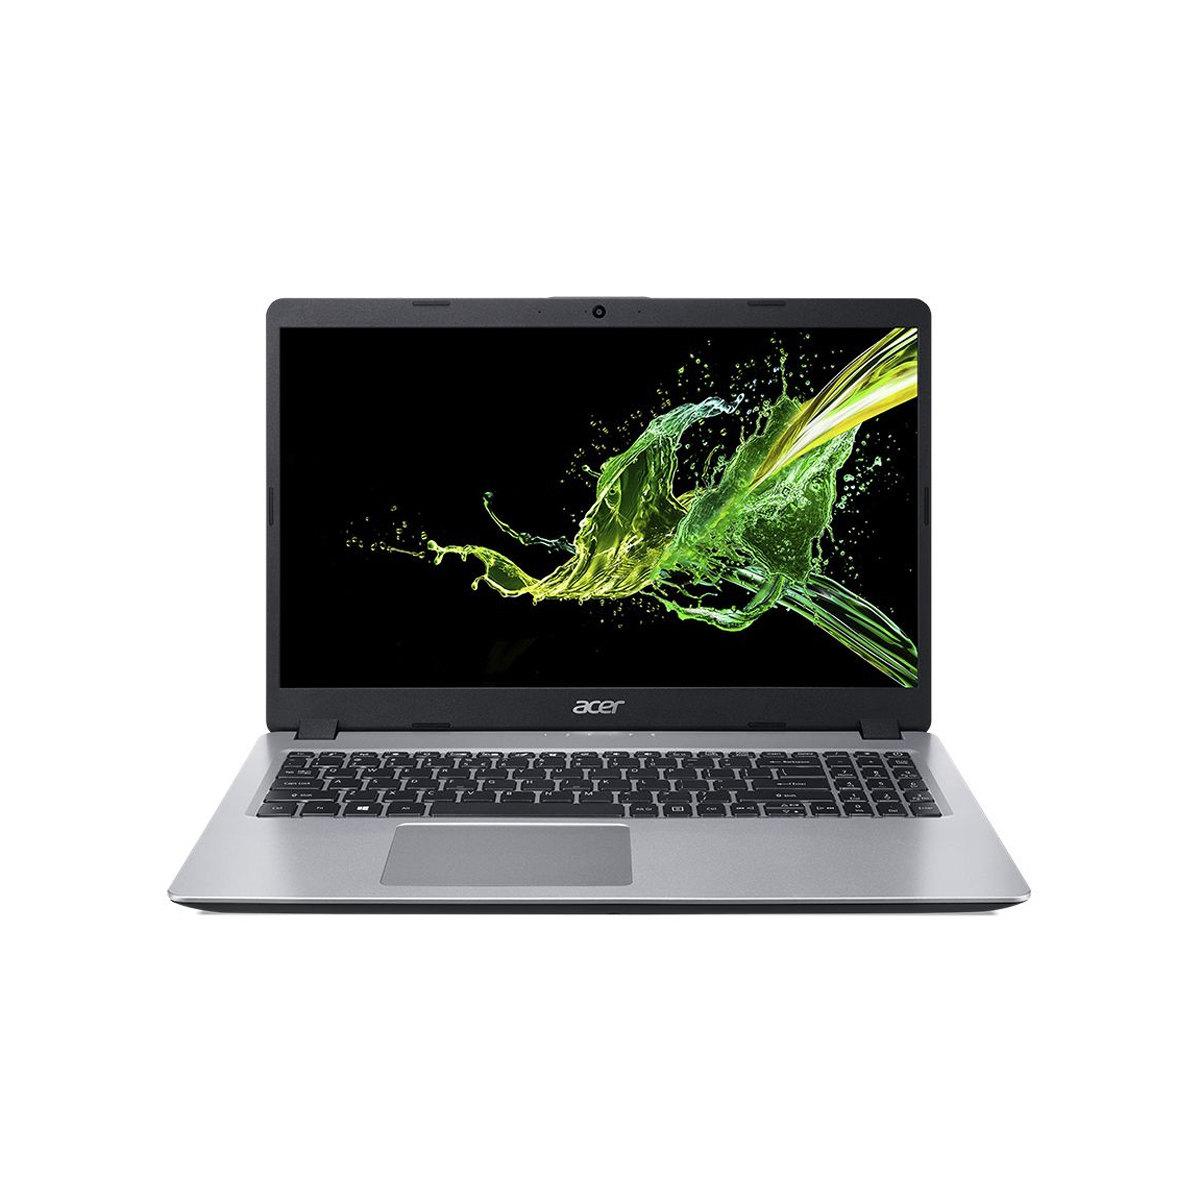 Notebook Acer A515 Core I5 8265u Memoria 4gb Ddr4 Hd 1tb Ssd 120gb Tela 15.6' Led Hd Sistema Windows 10 Home